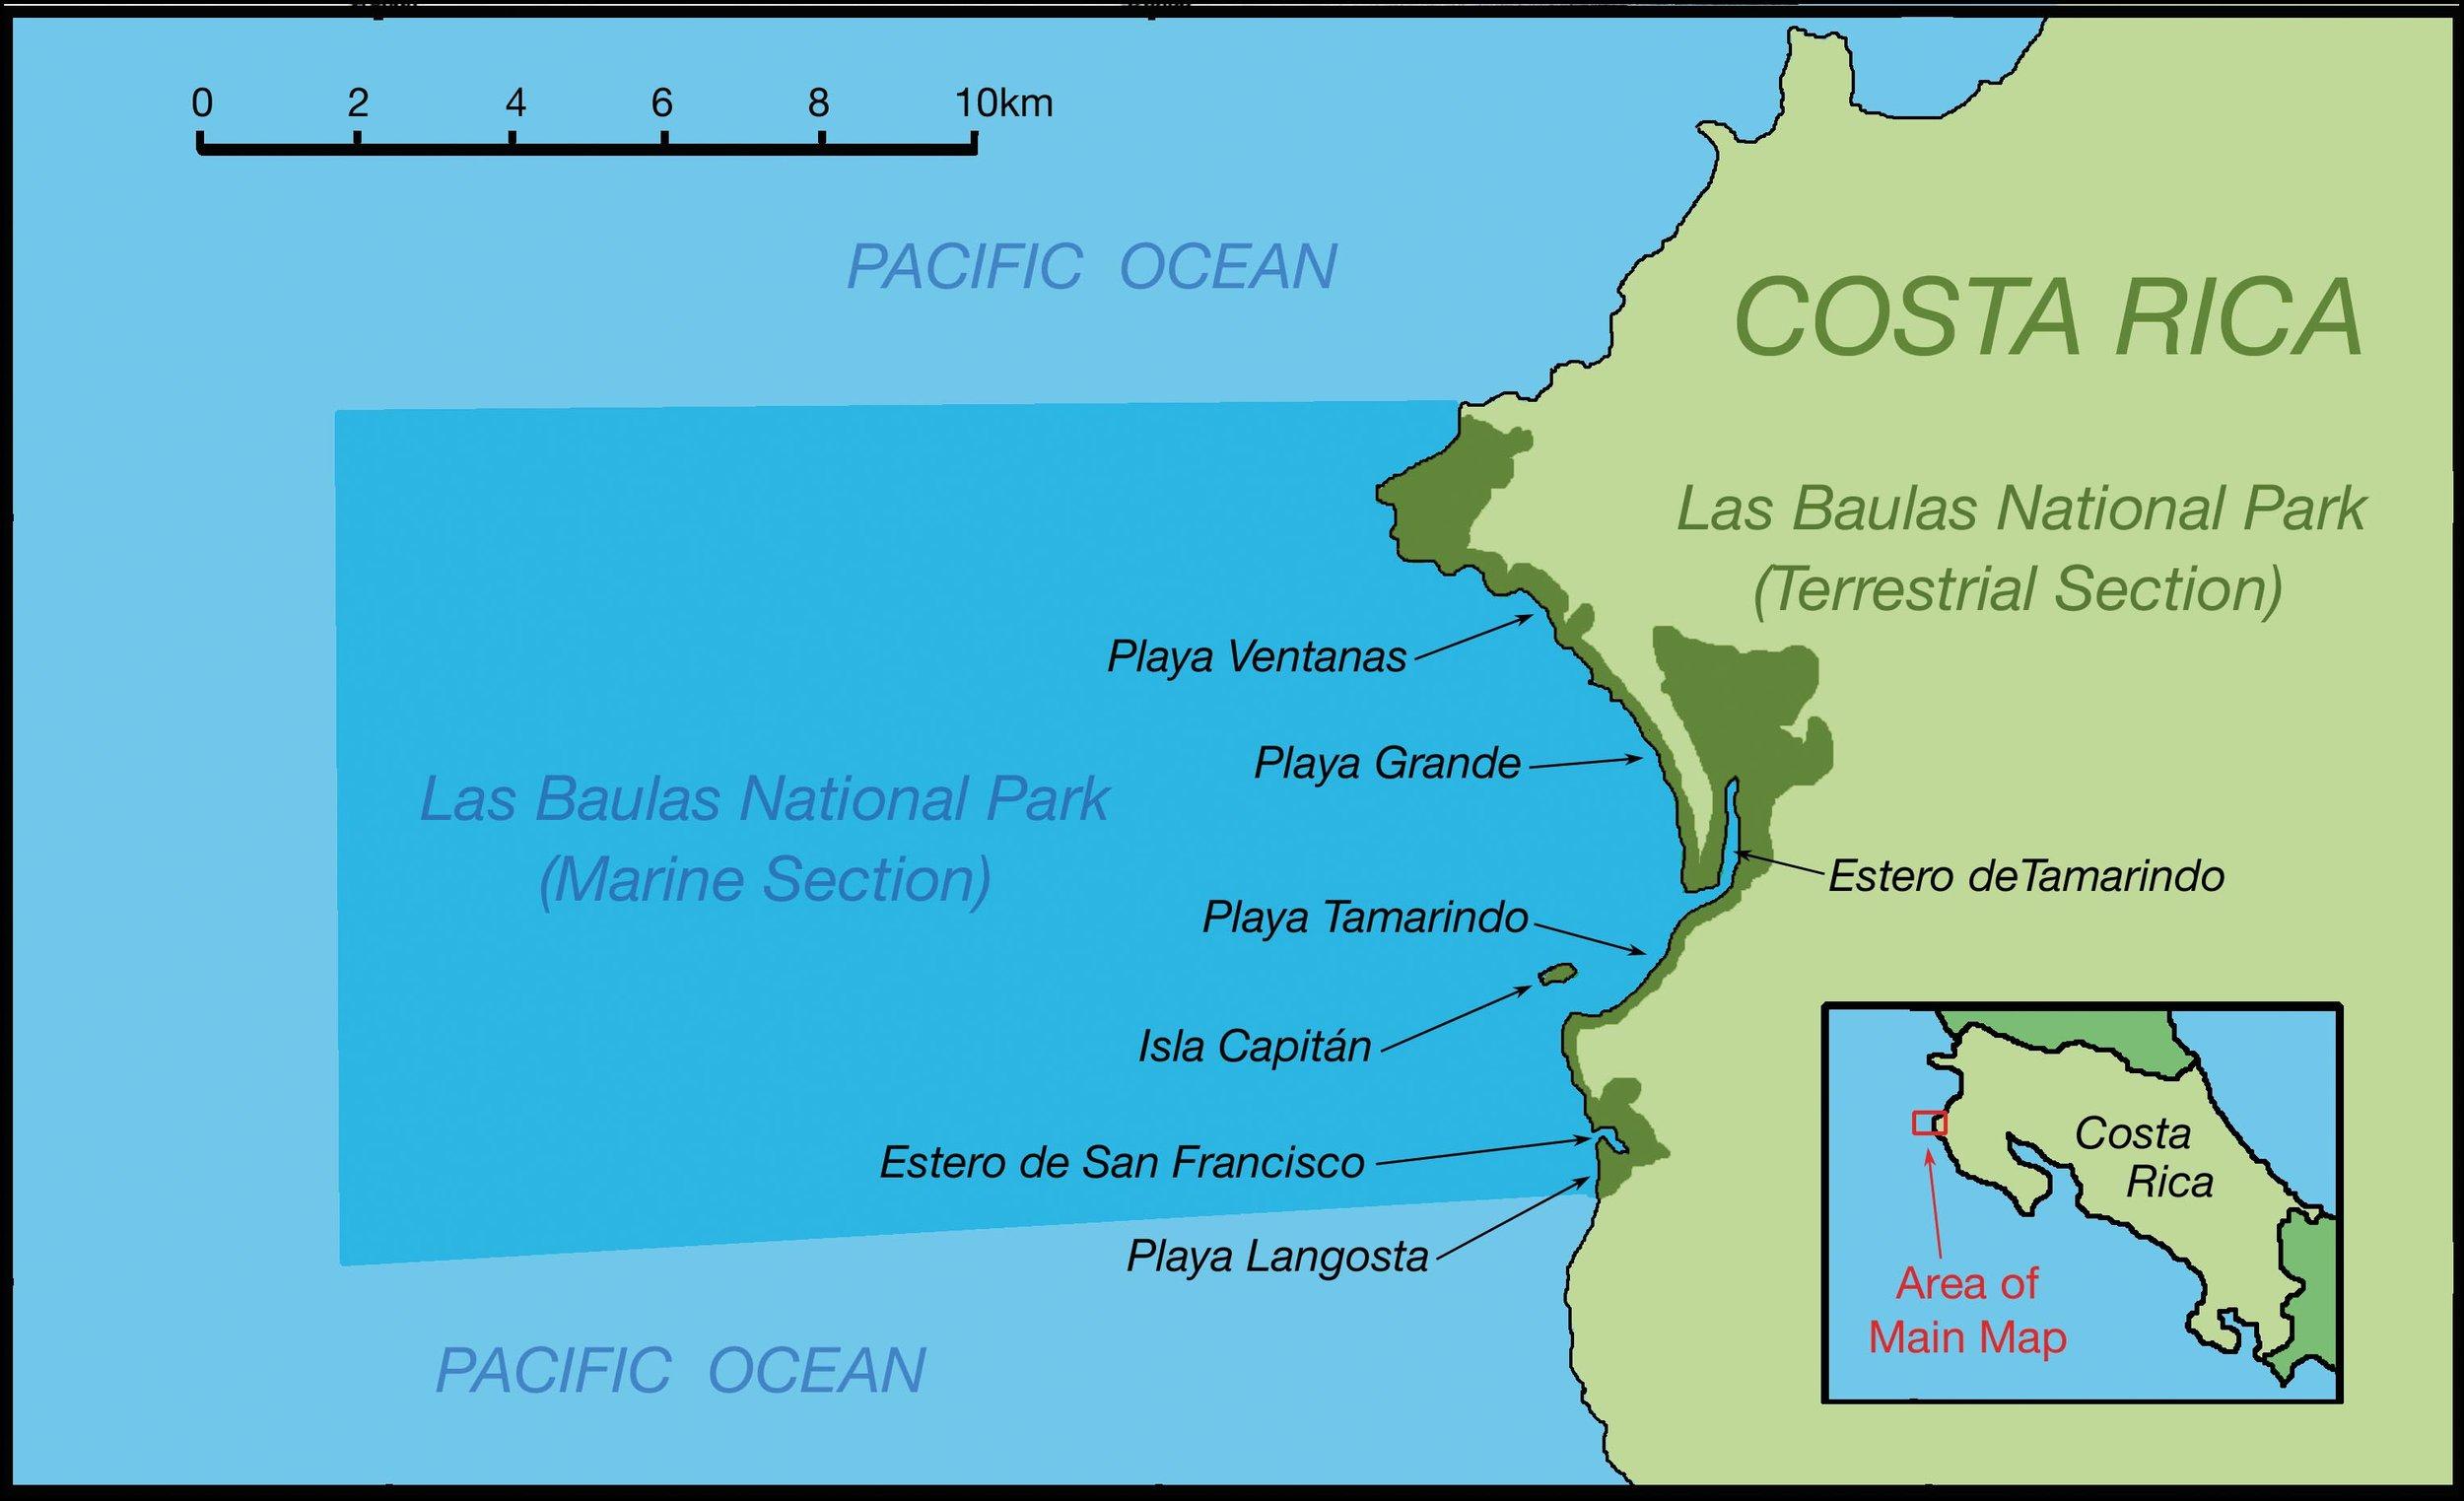 Las Baulas National Park, Costa Rica. © STEPHEN NASH / CONSERVATION INTERNATIONAL